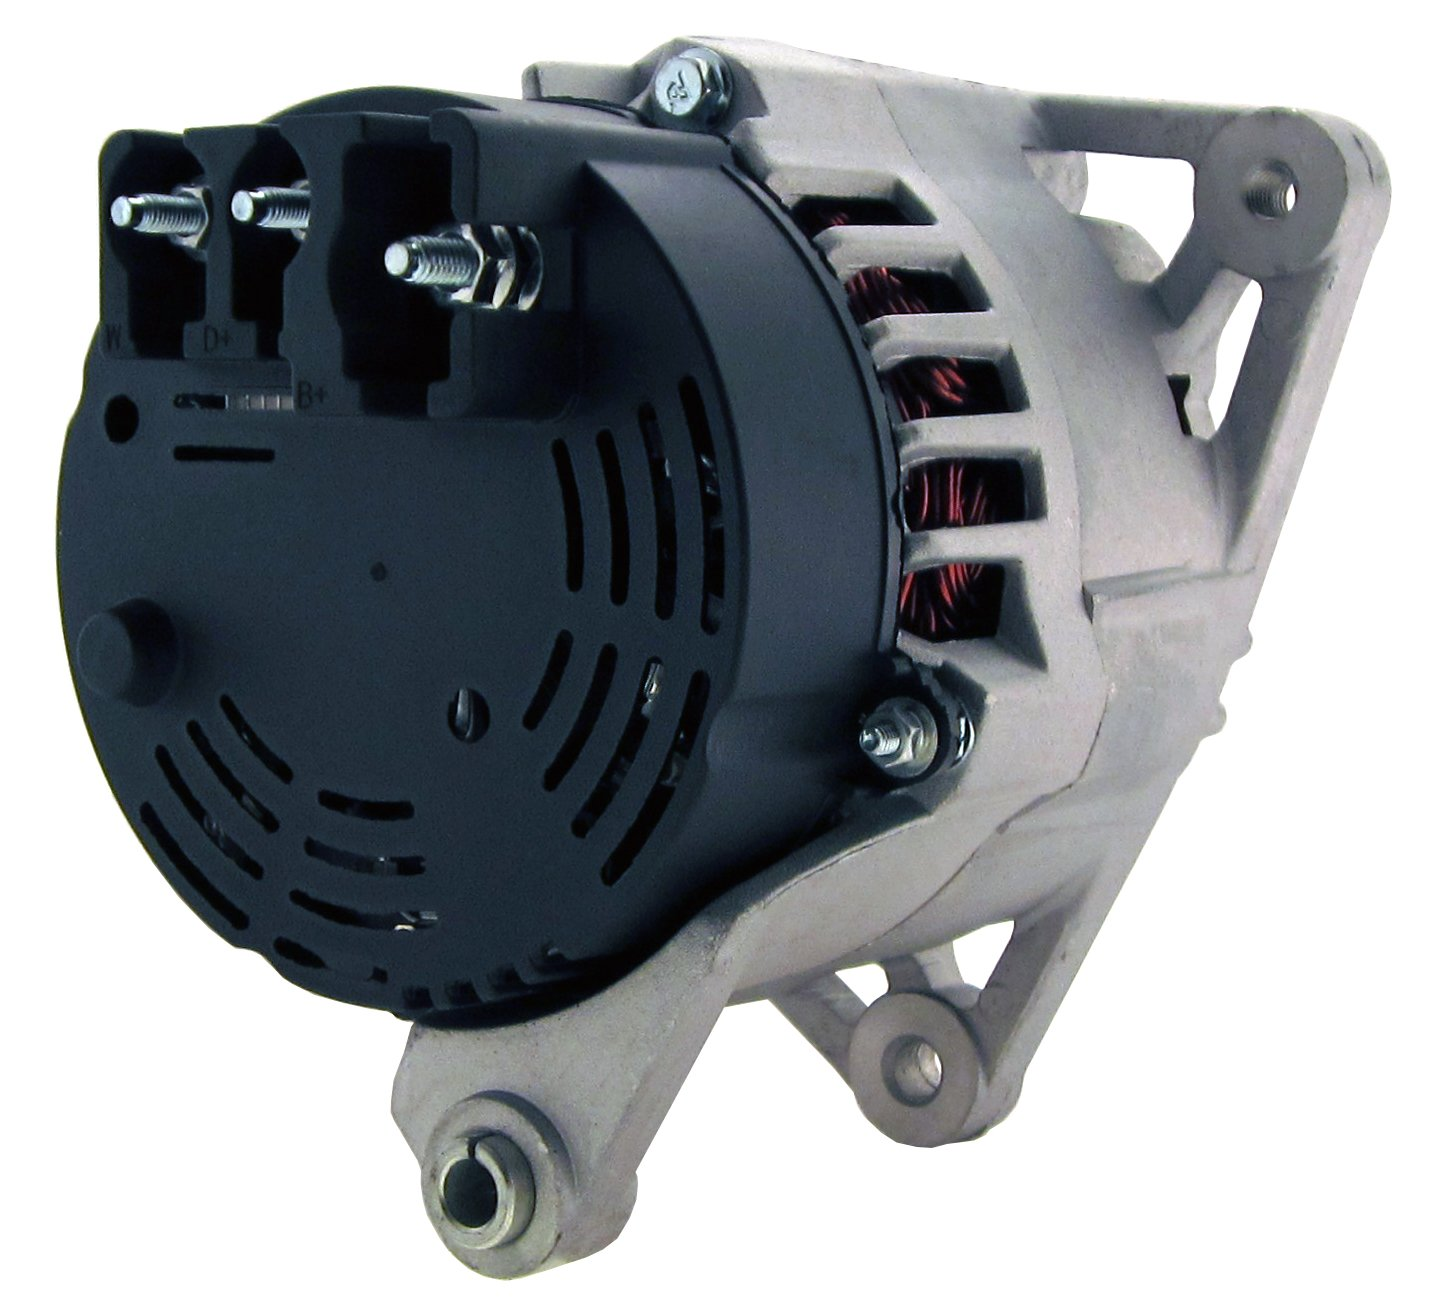 New Premium Alternator fits Caterpillar Ag /& Ind Equip JCB Loadalls 63377462 MAN7462 102211-8180 305-3661 714//32200 185046522 185046523 2871A303 TPN758 90-19-2514 2871A300 TPN771 2871A307 54022775